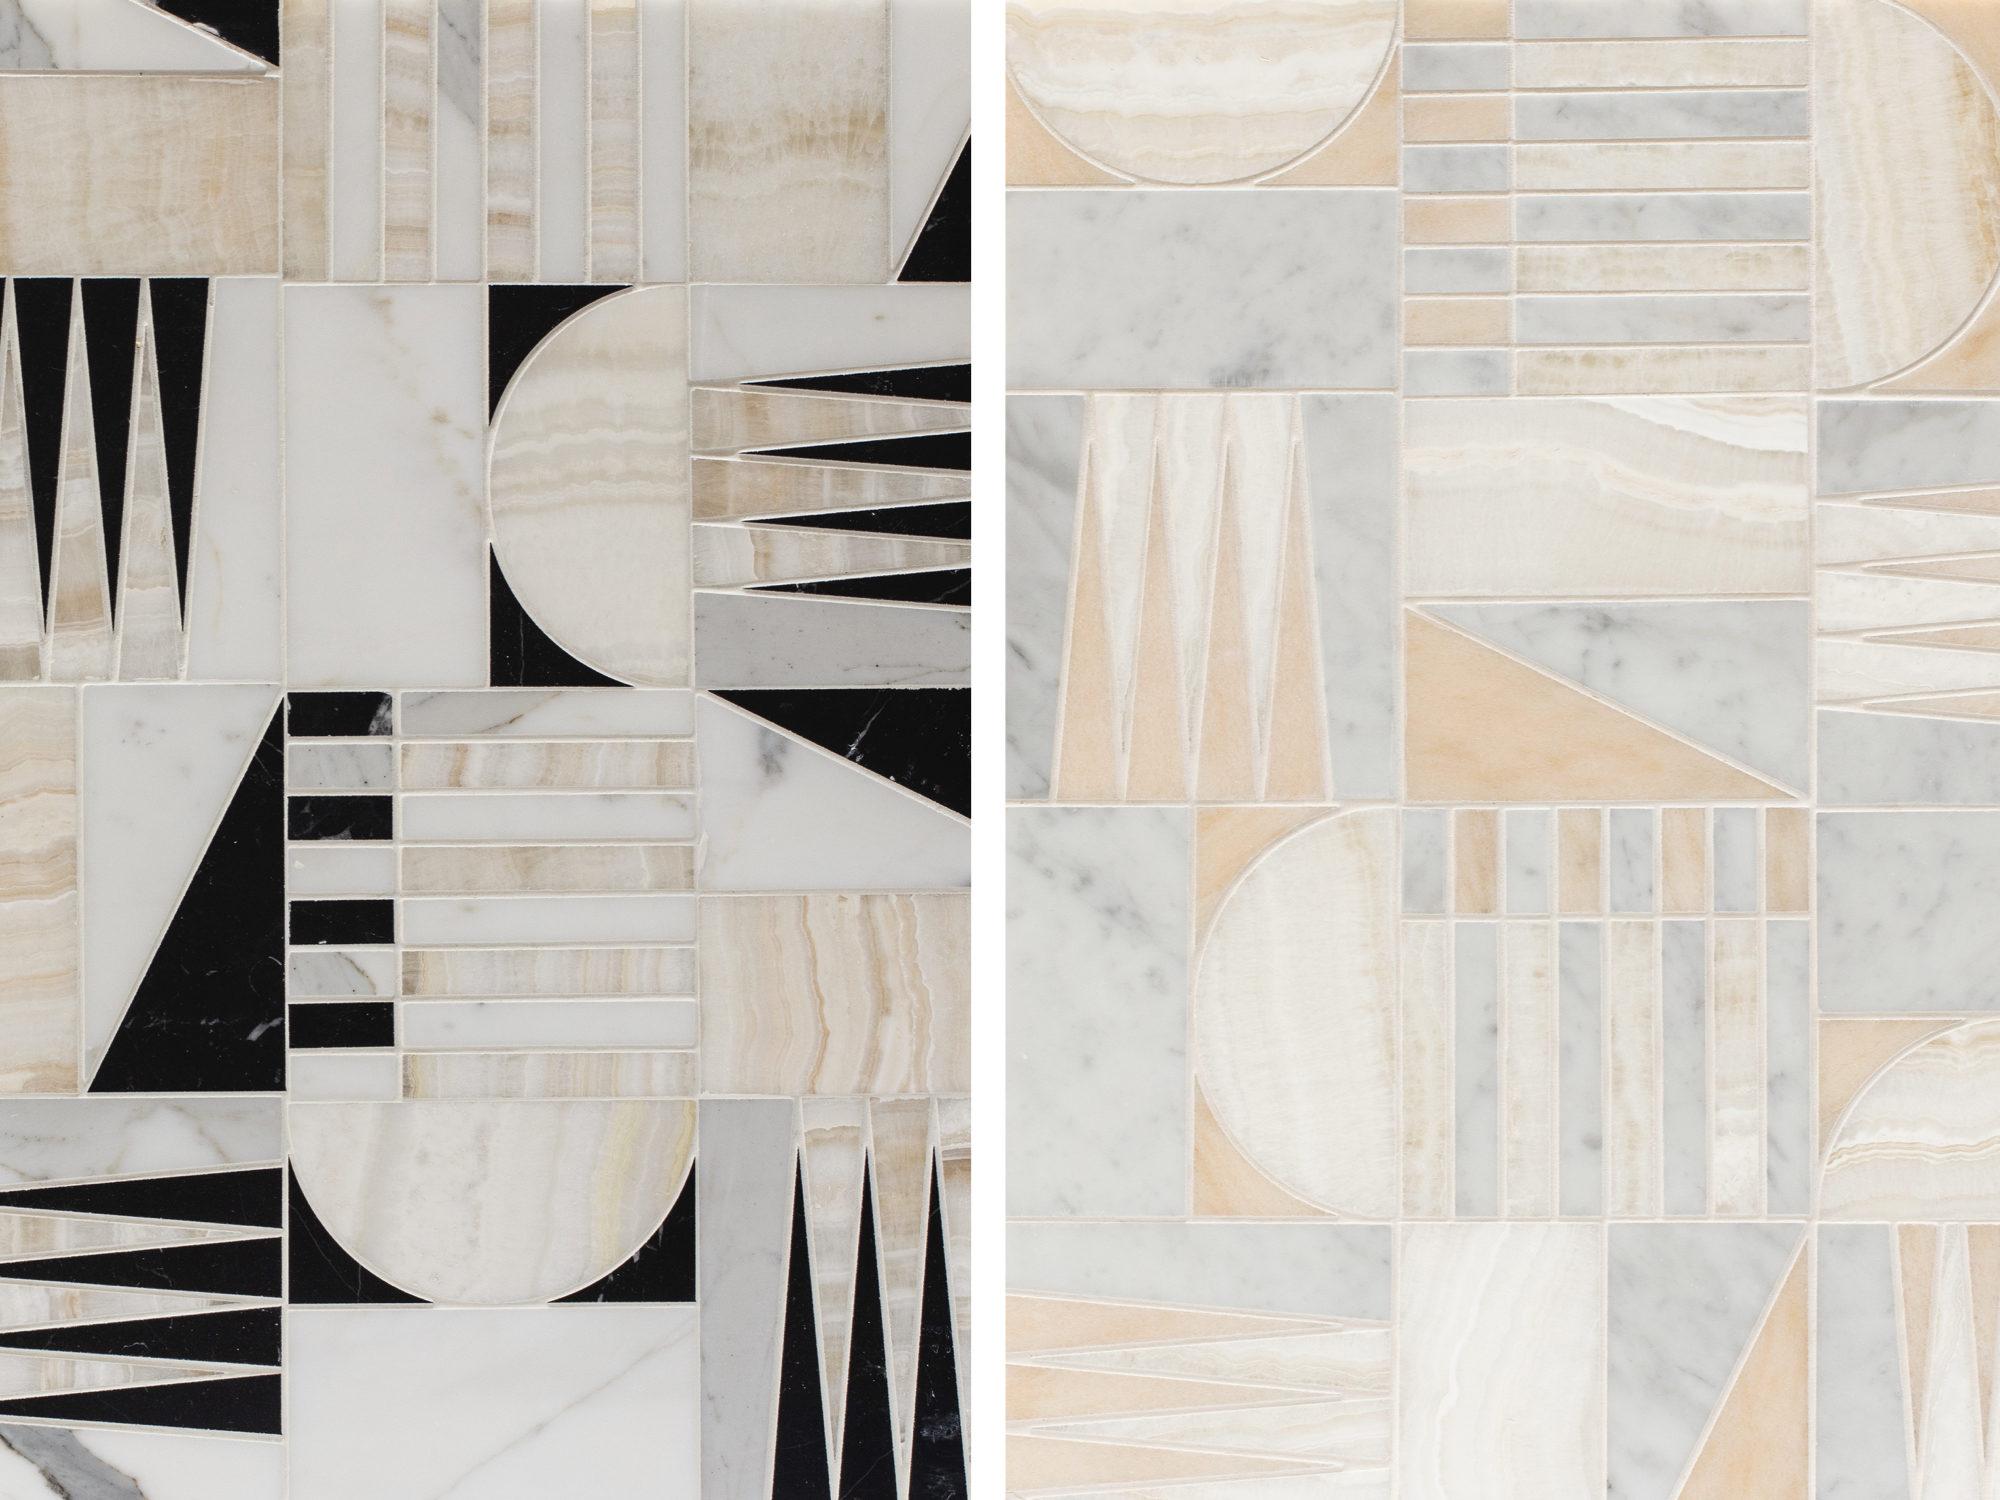 alison-rose-euclid-artistic-tile-02-2000x1500-1